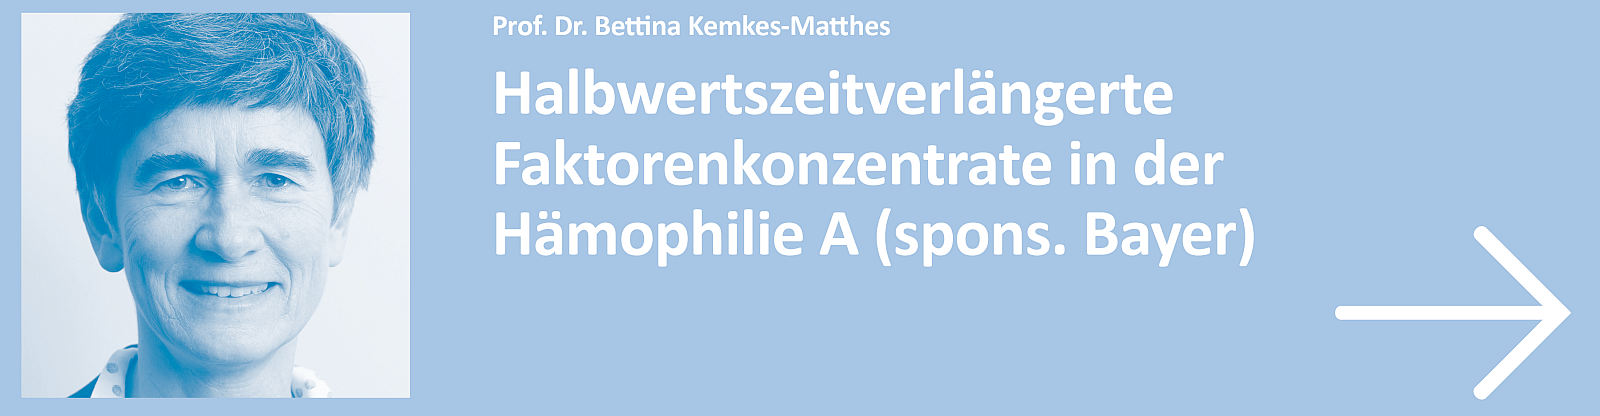 Beitrag B Kemkes-Matthes_1600x410